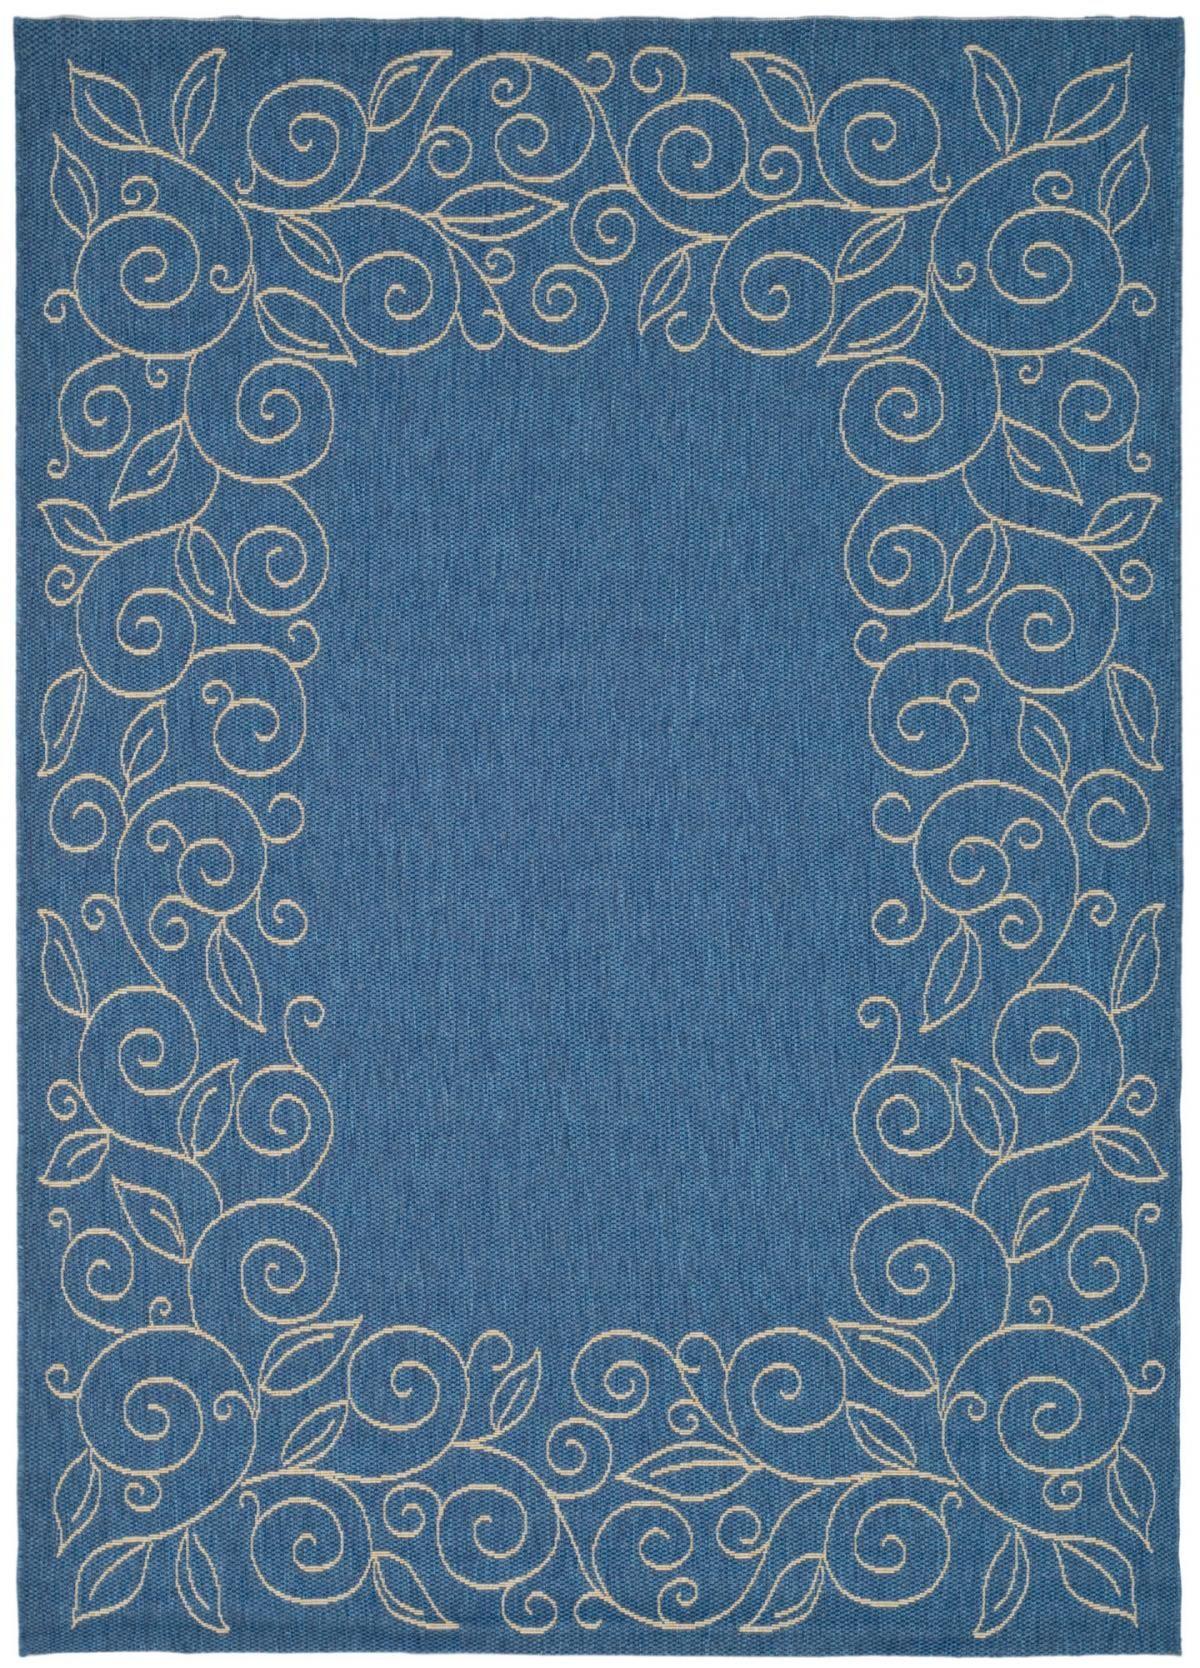 Vine scroll patio carpet power loom indoor outdoor rugs and patios cy5139c bedroom rugsblue baanklon Gallery